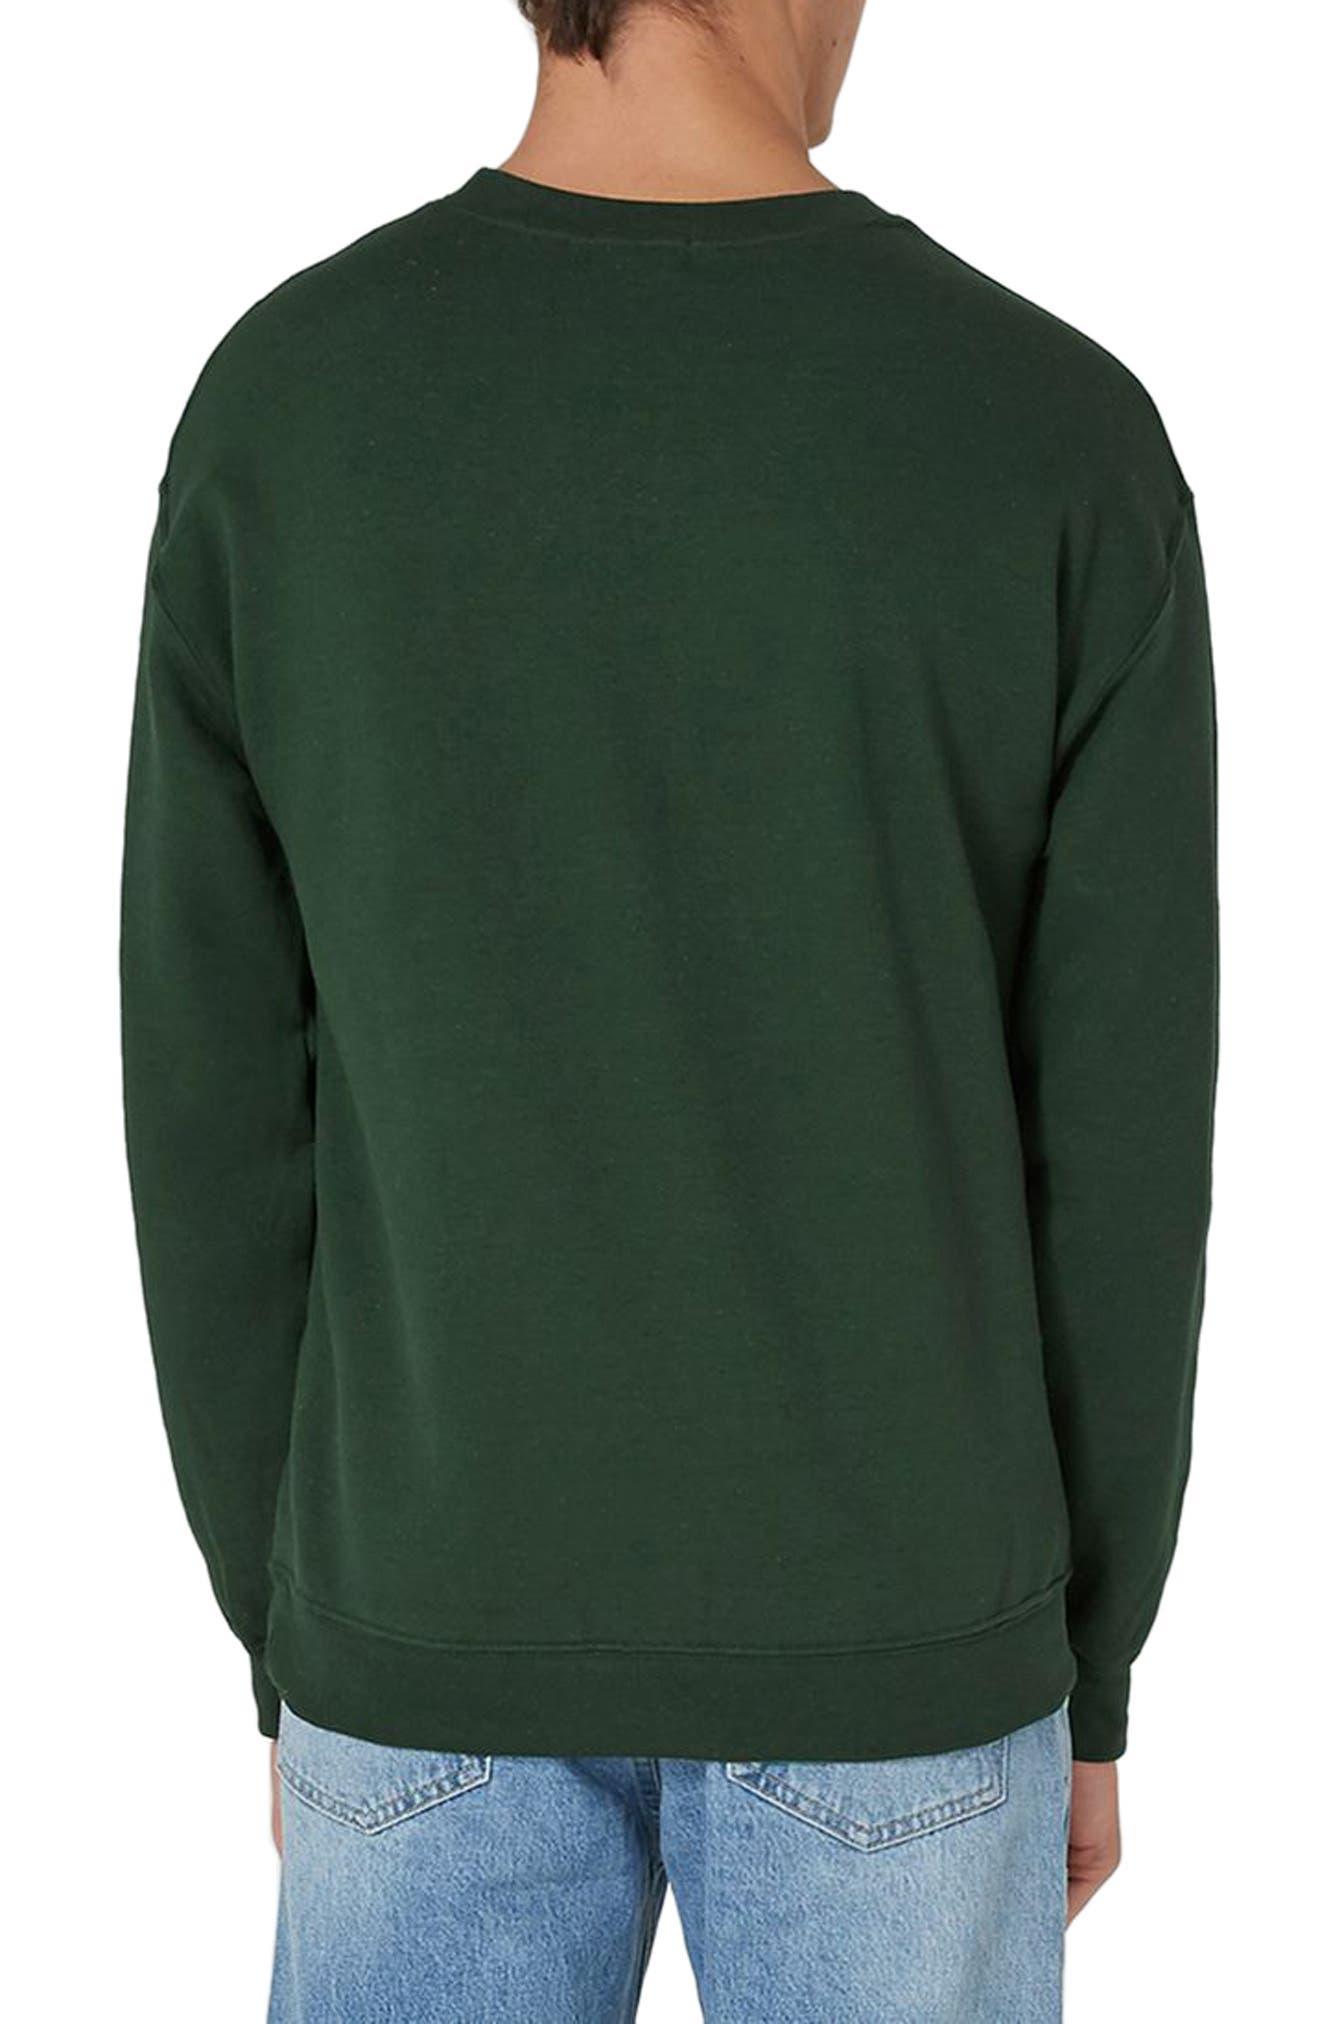 Tiger Patch Sweatshirt,                             Alternate thumbnail 2, color,                             Olive